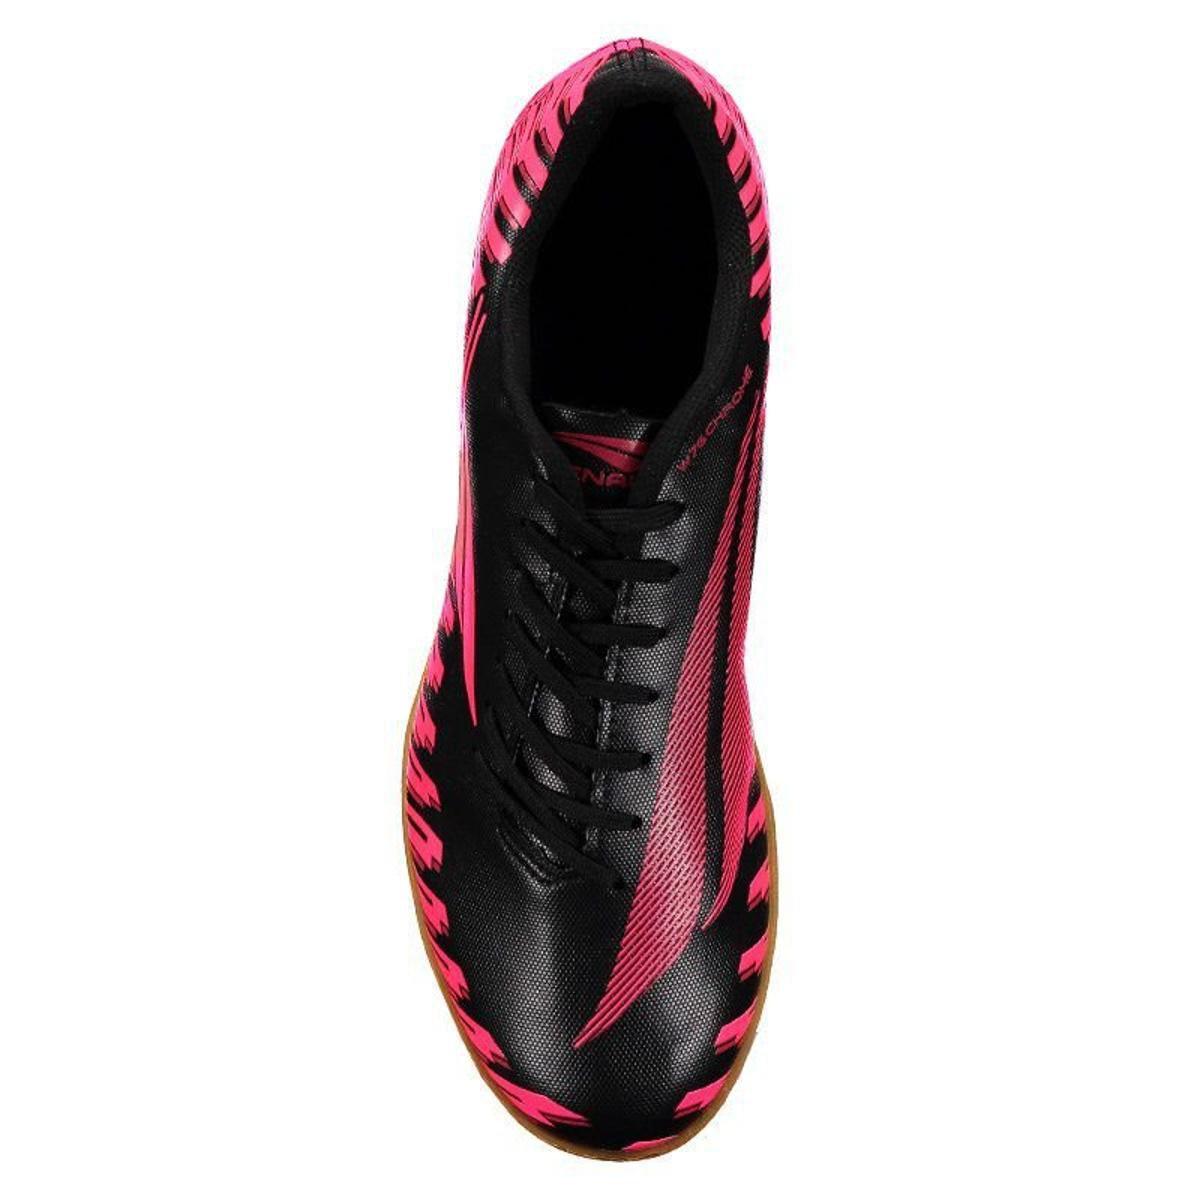 Chuteira Futsal Penalty Storm Speed IX Masculina - Preto e Rosa ... 4a3f3a2d8a46d